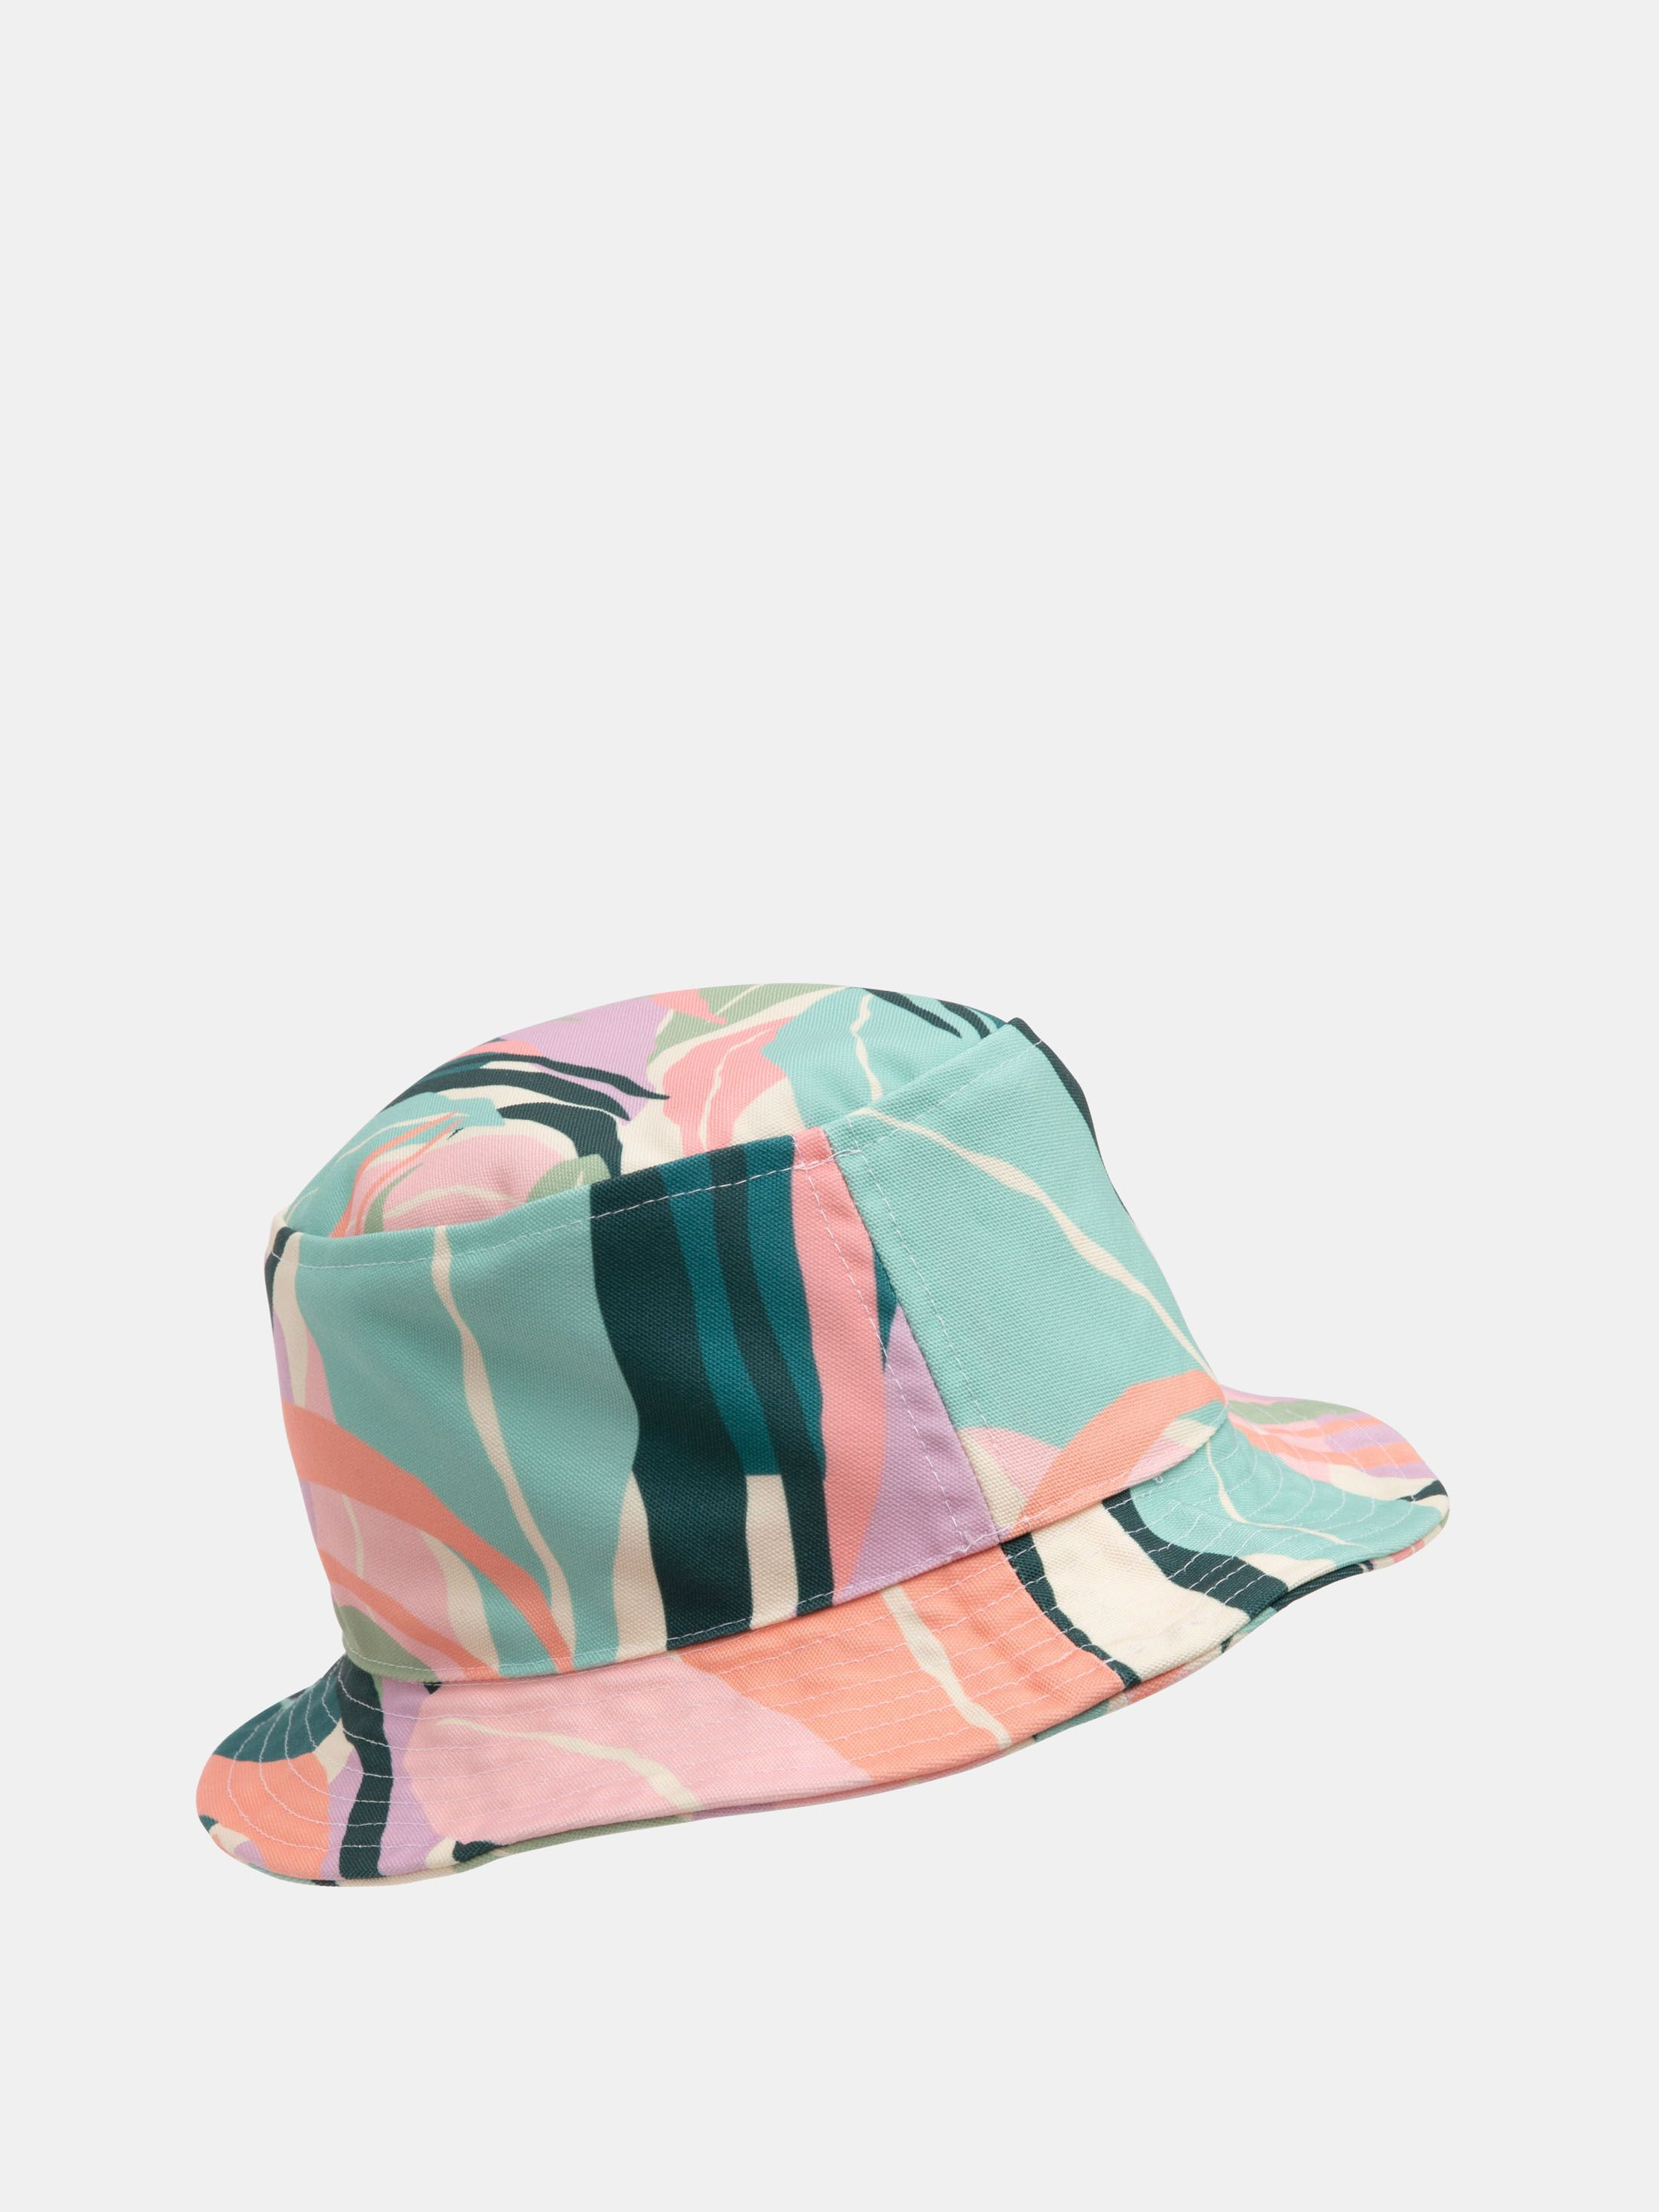 custom made bucket hats with prints or logos